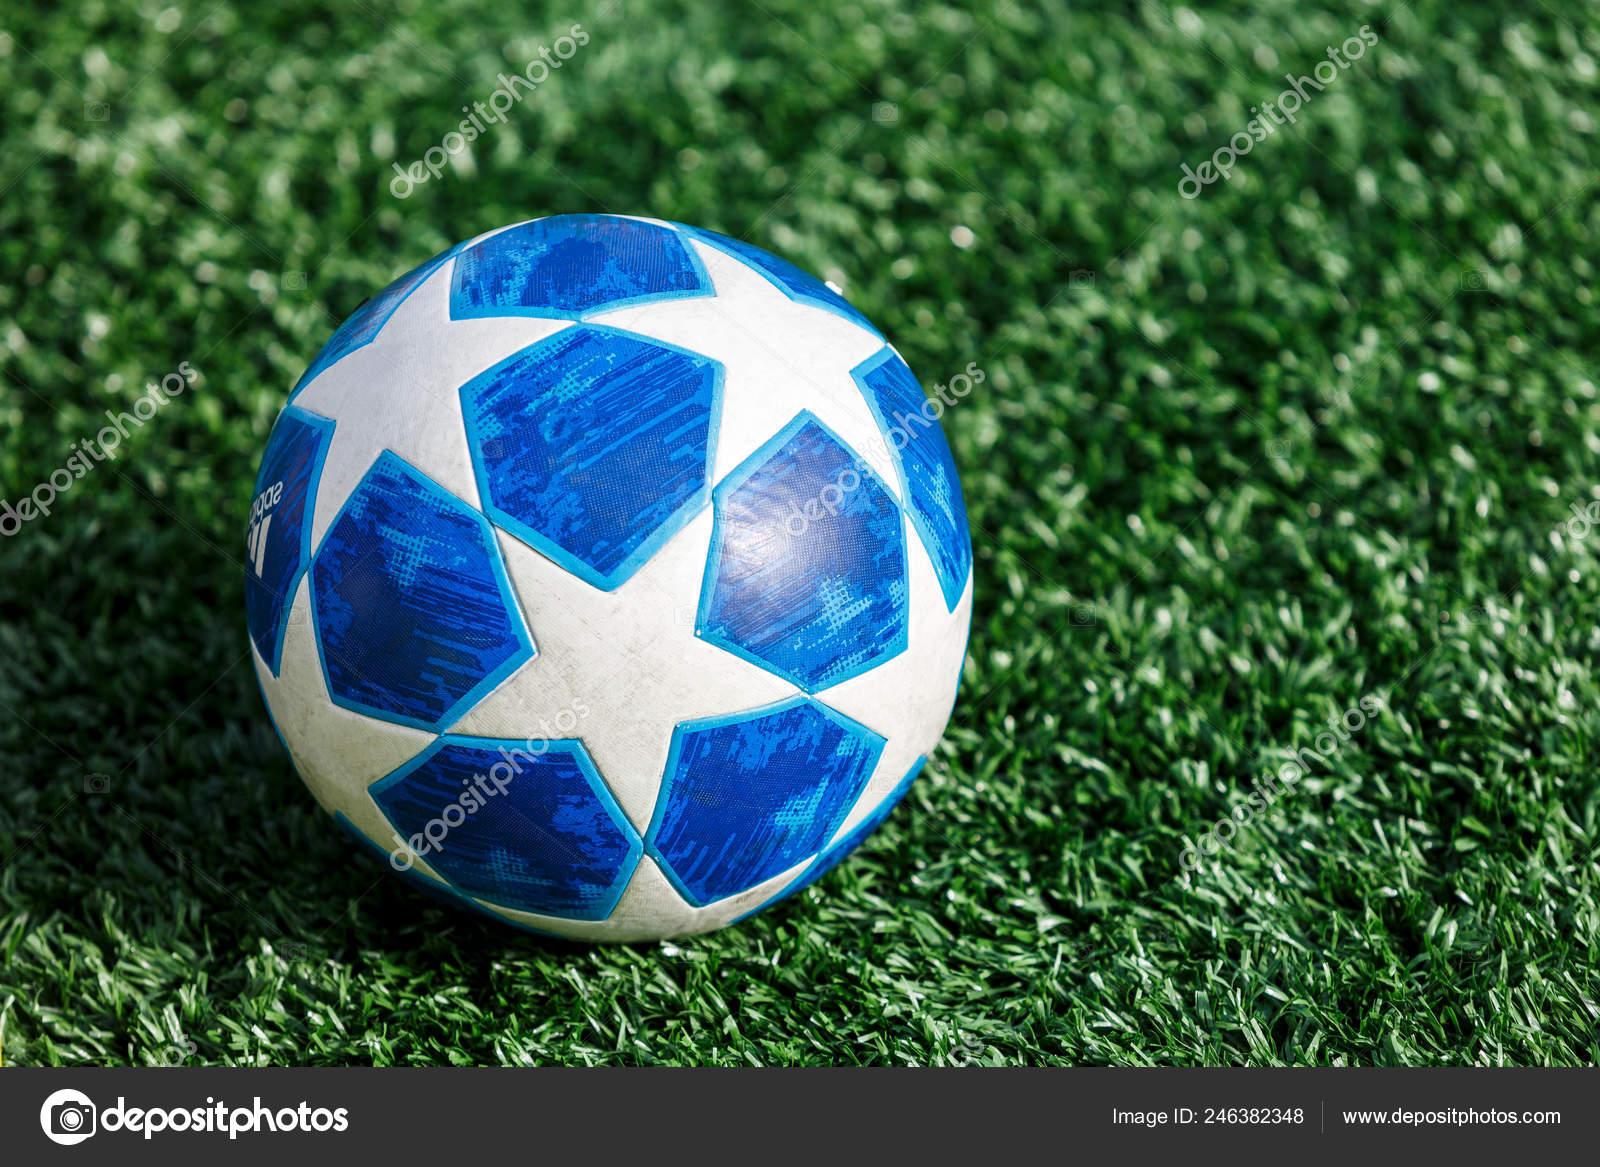 d5ce36cc Kyiv Ukraine February 2019 Official Match Ball Uefa Champions League ...